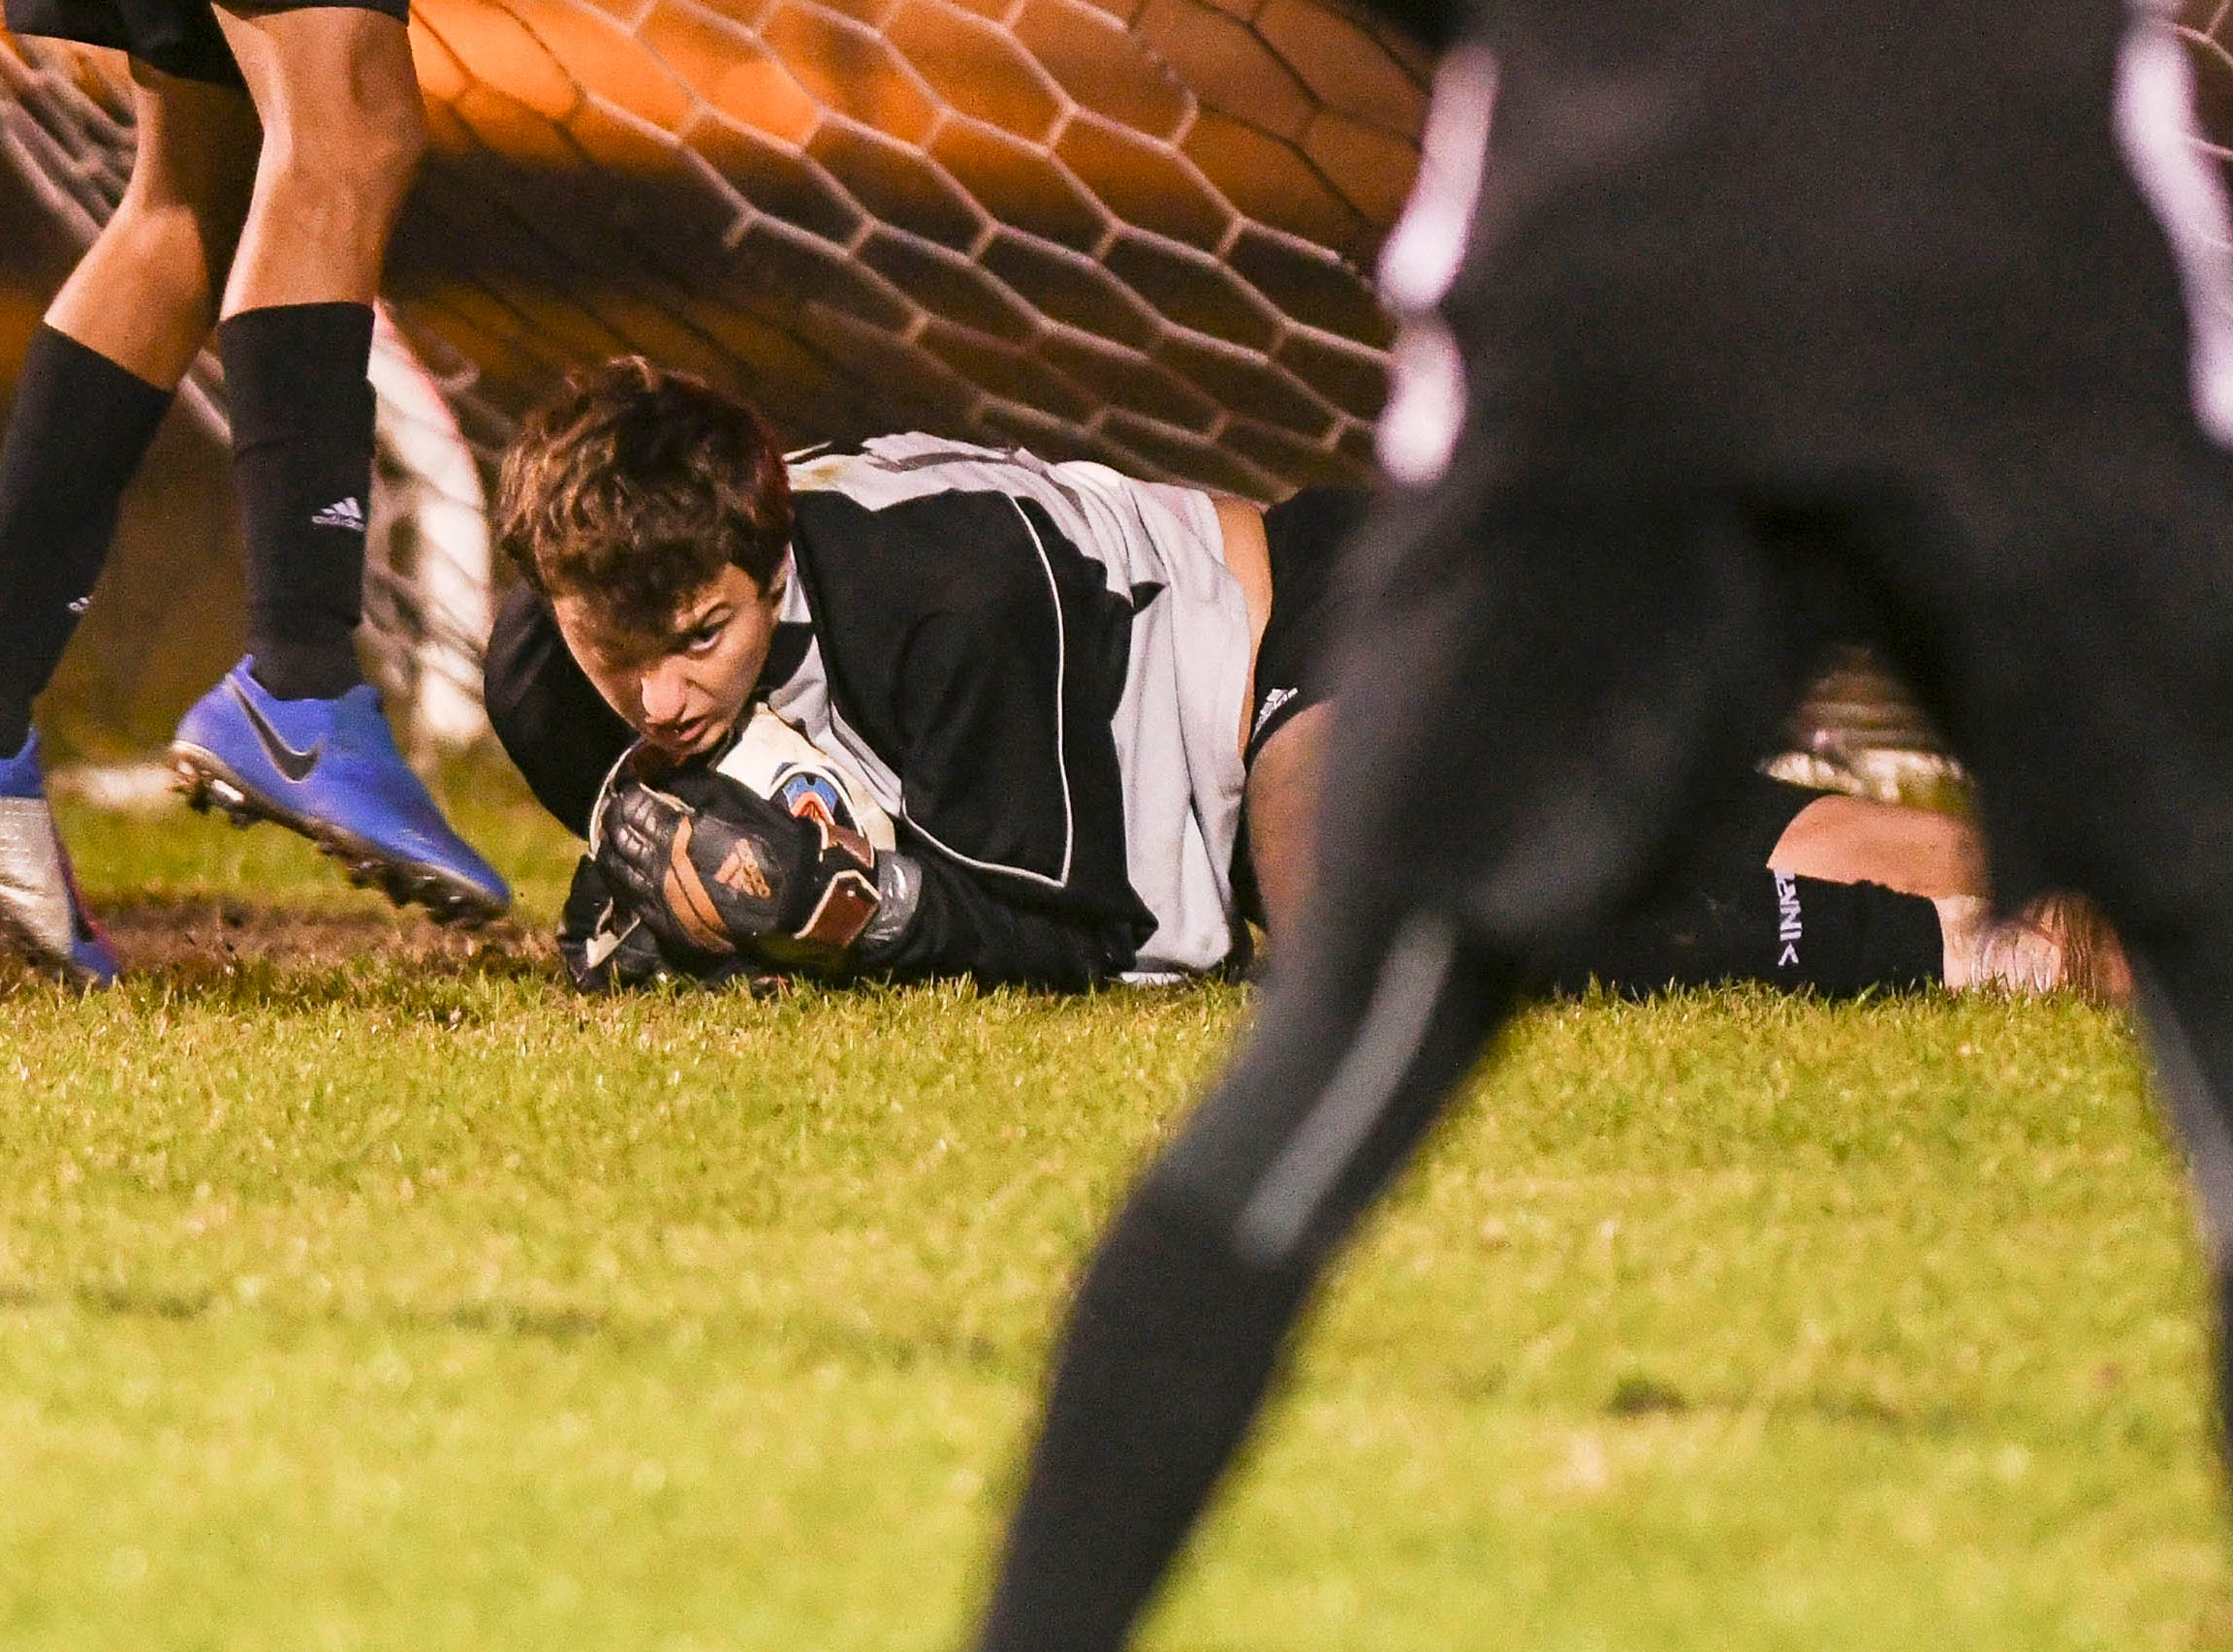 Rockledge goalkeeper Alex Rahal dives on a ball during Wednesday's District 12, Class 3A semifinal against Merritt Island.